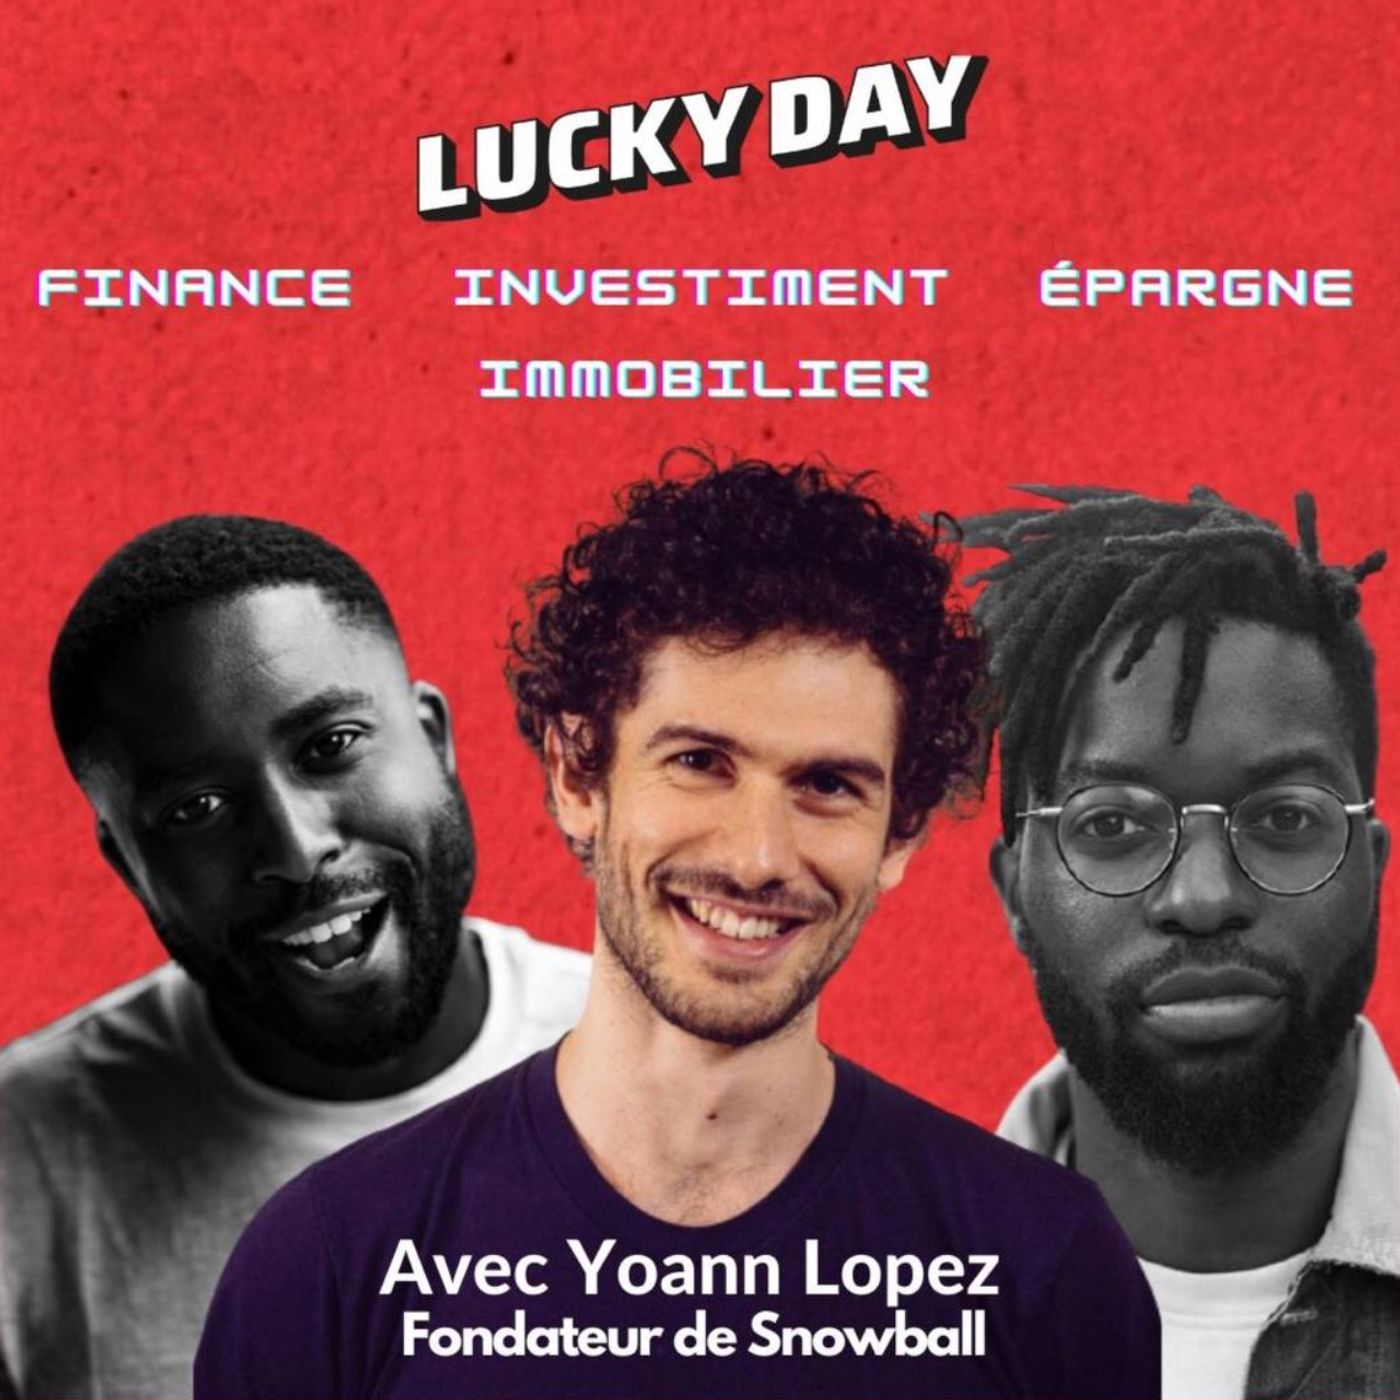 LUCKY YOU EP01: ON PARLE FINANCE AVEC YOANN LOPEZ FONDATEUR DE SNOWBALL